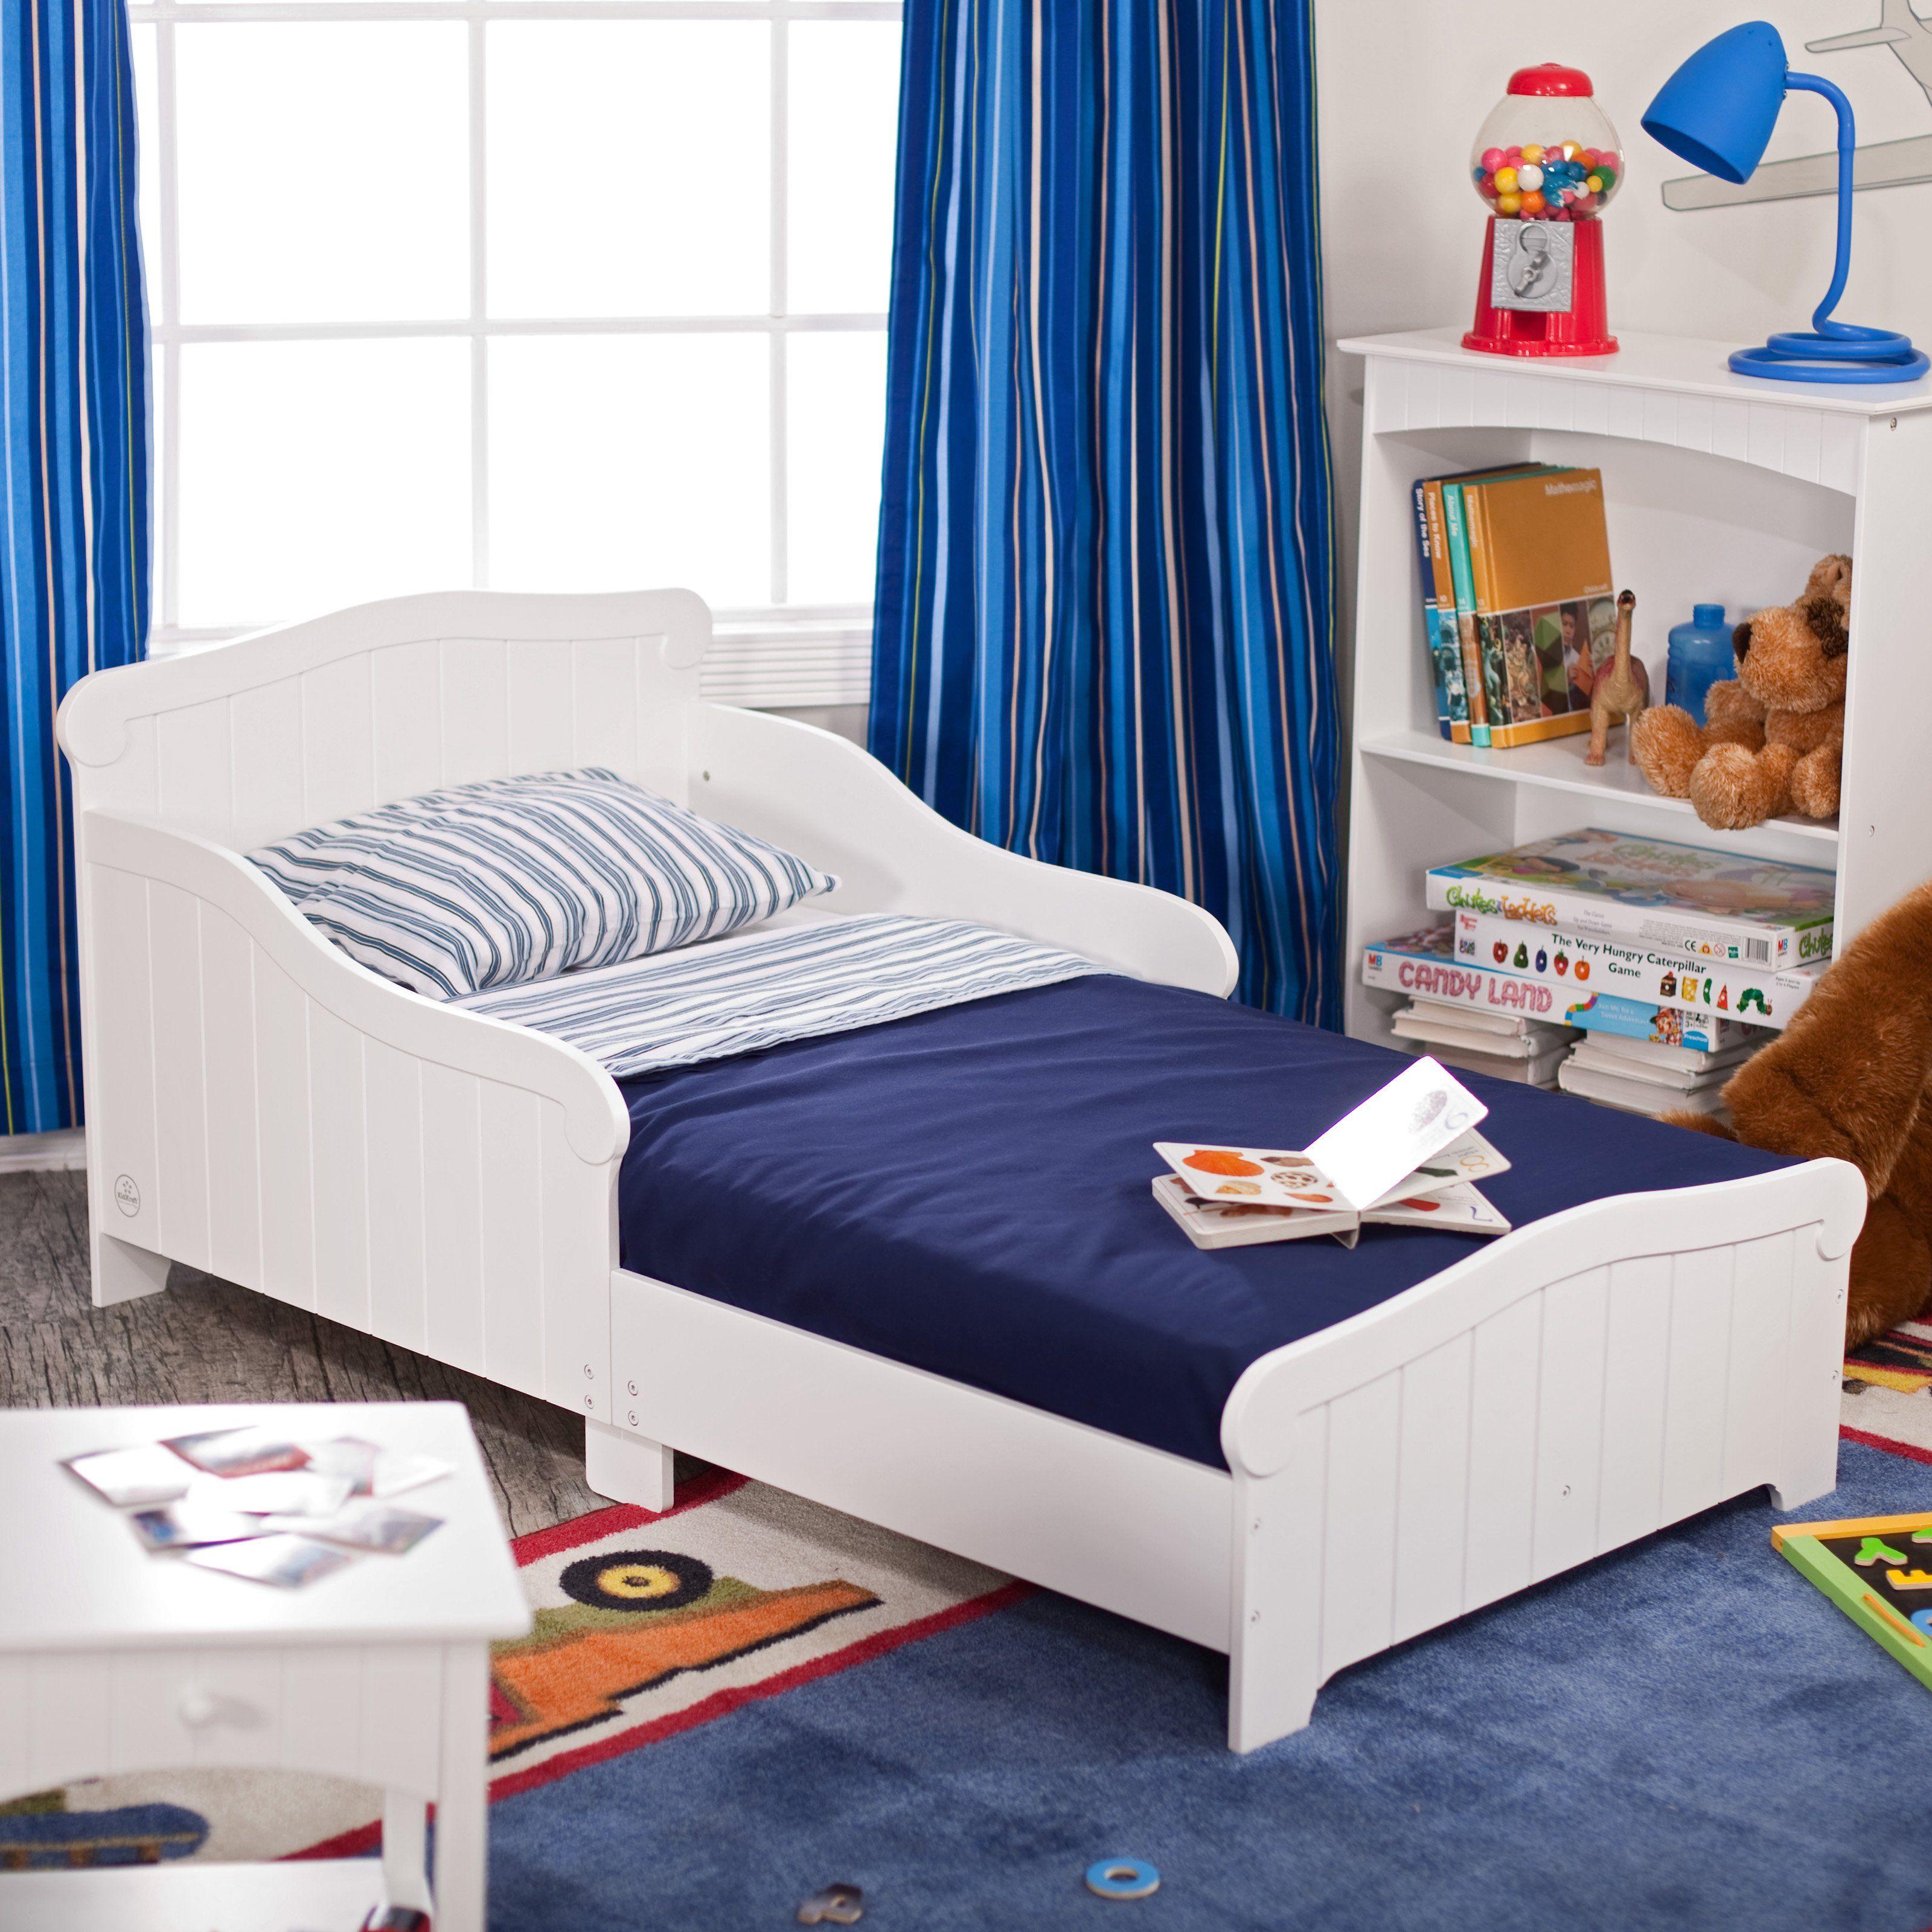 KidKraft Nantucket Toddler Bed 11398